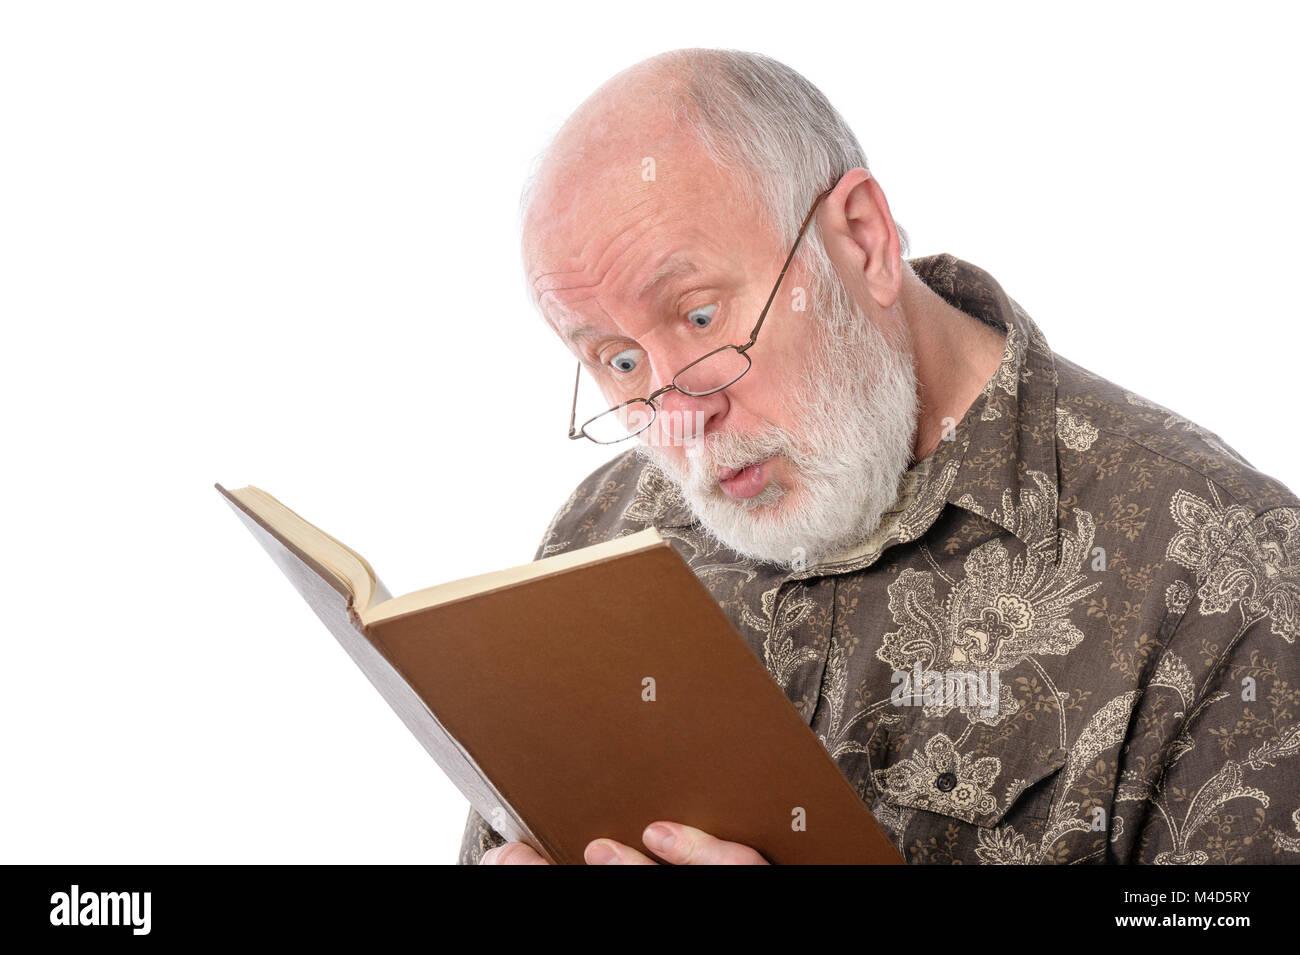 Cheerfull senior man isolated on white - Stock Image